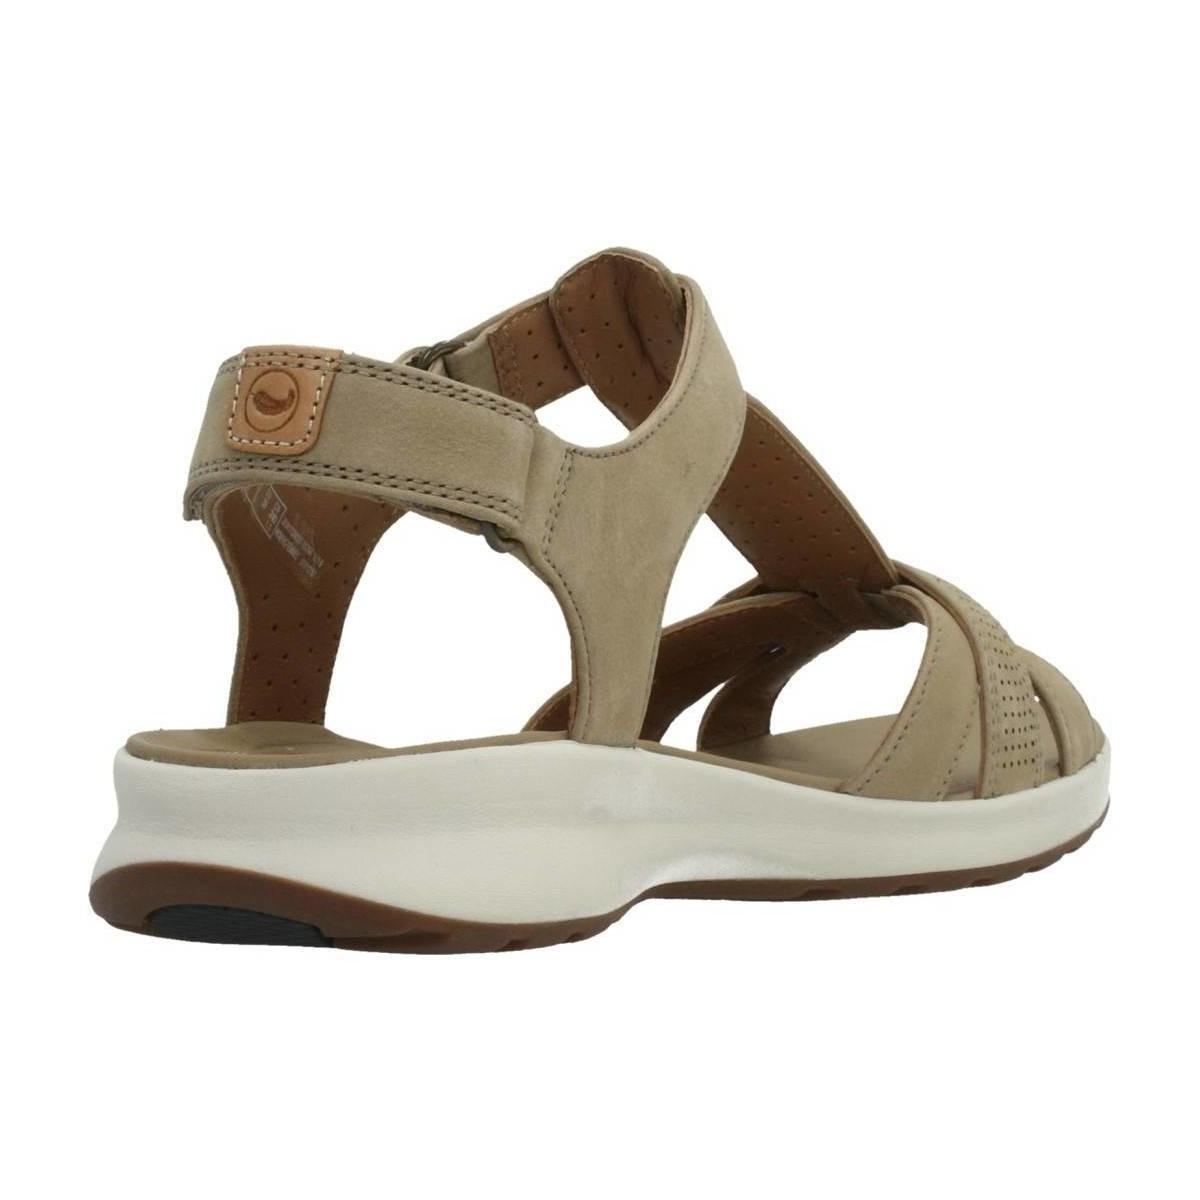 56b24048f792 Clarks Un Adorn Vibe Sand Nubuck Women s Sandals In Brown in Brown ...